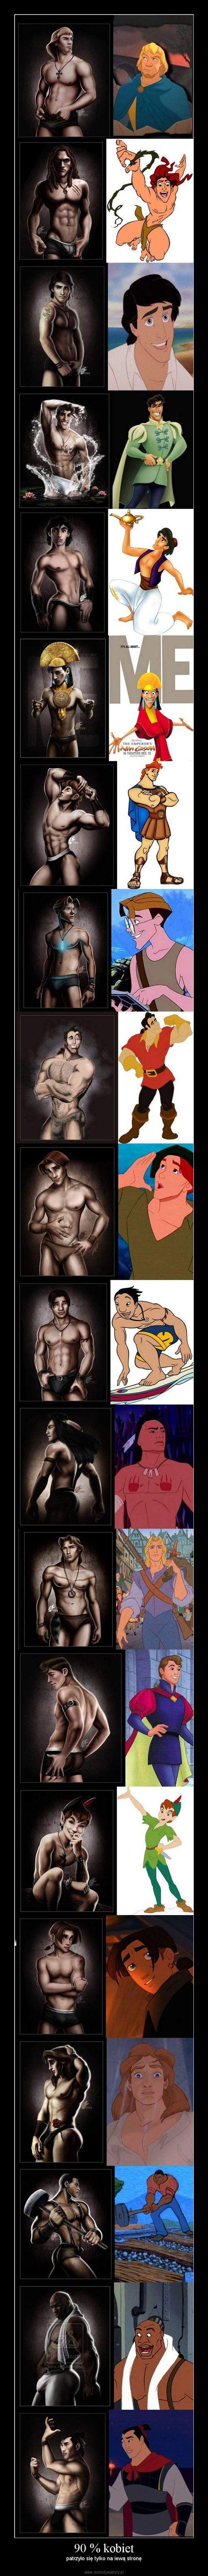 Bahaha sexy disney guys